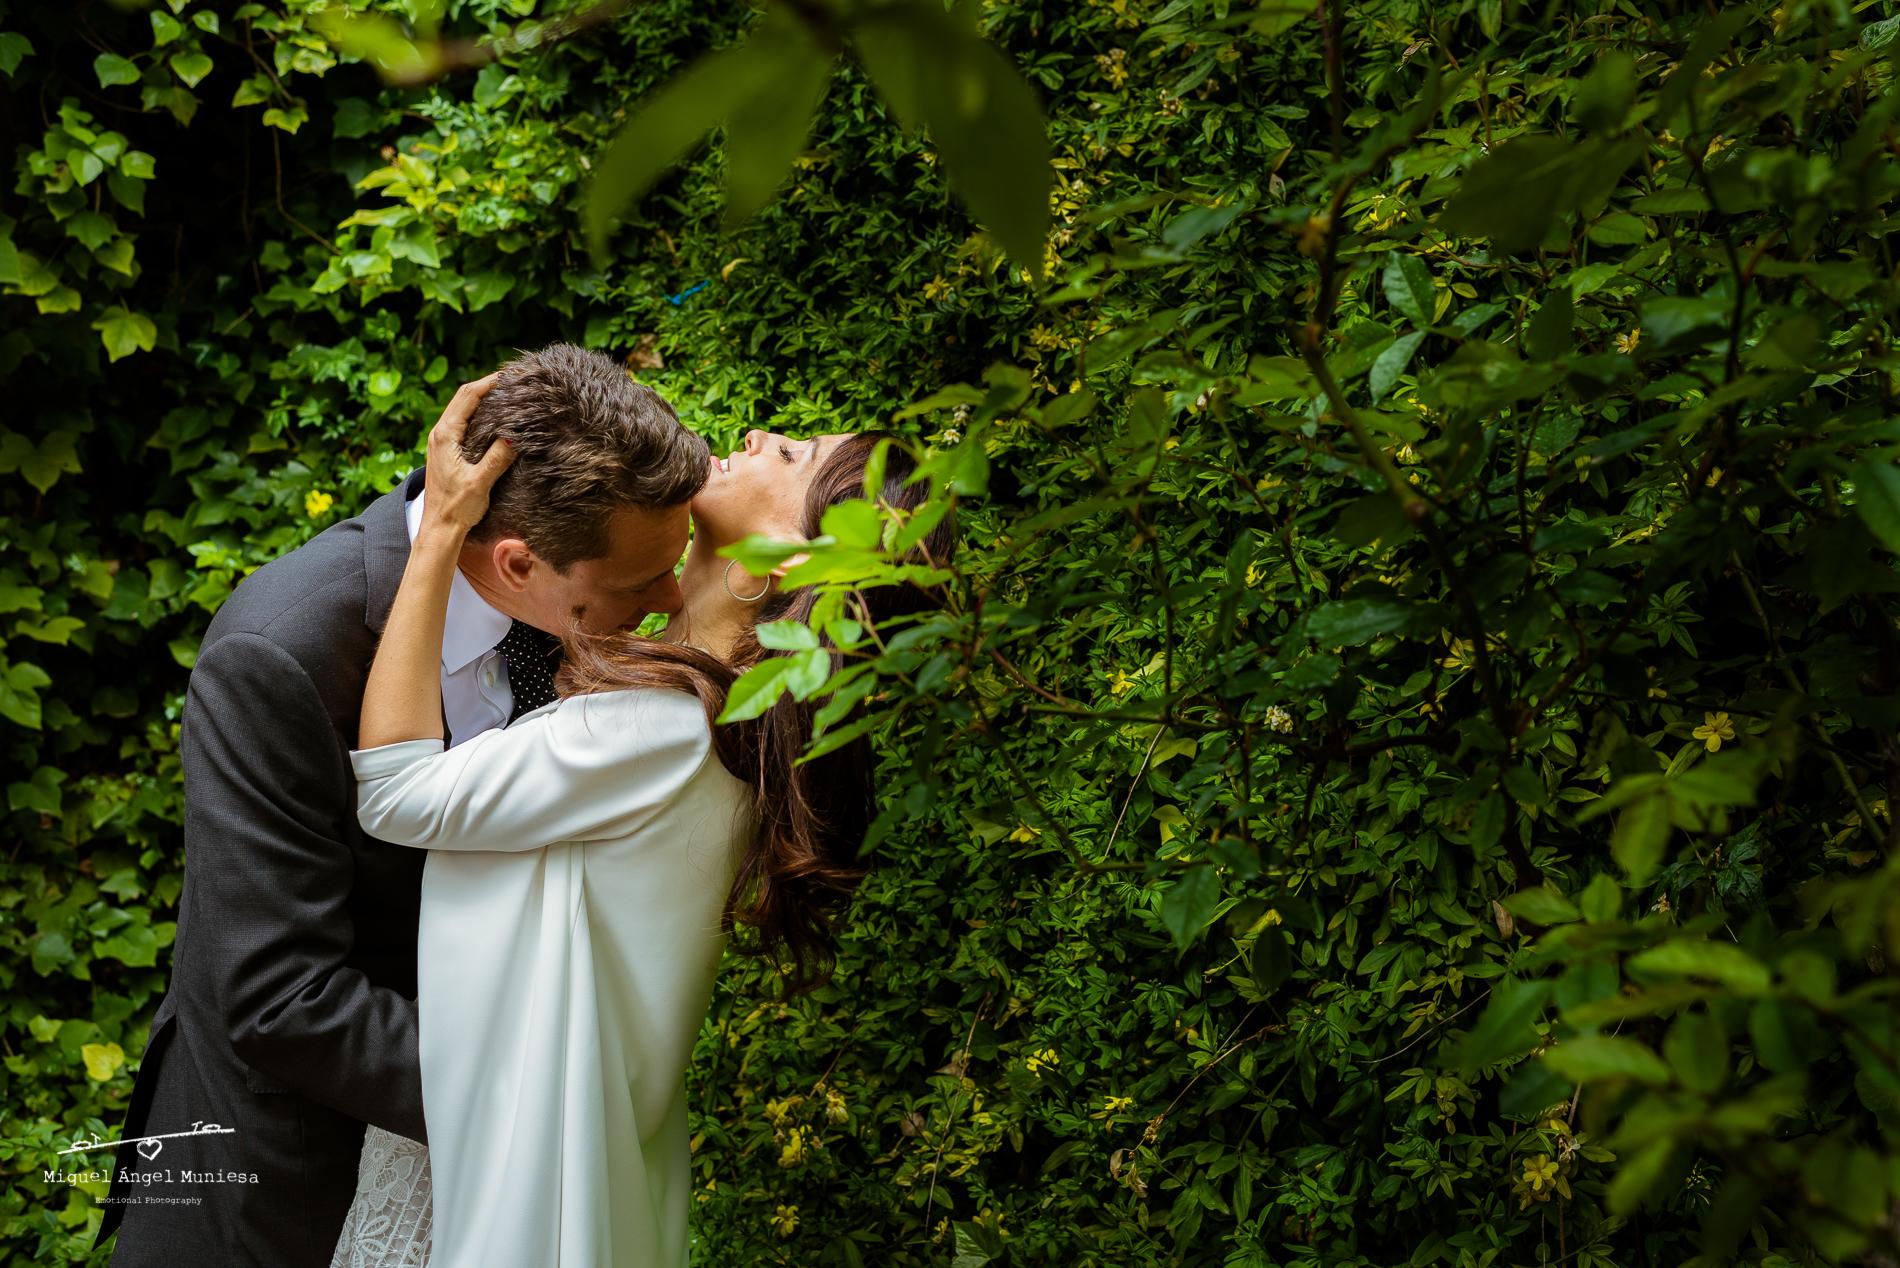 fotografo boda zaragoza, miguel angel muniesa_32